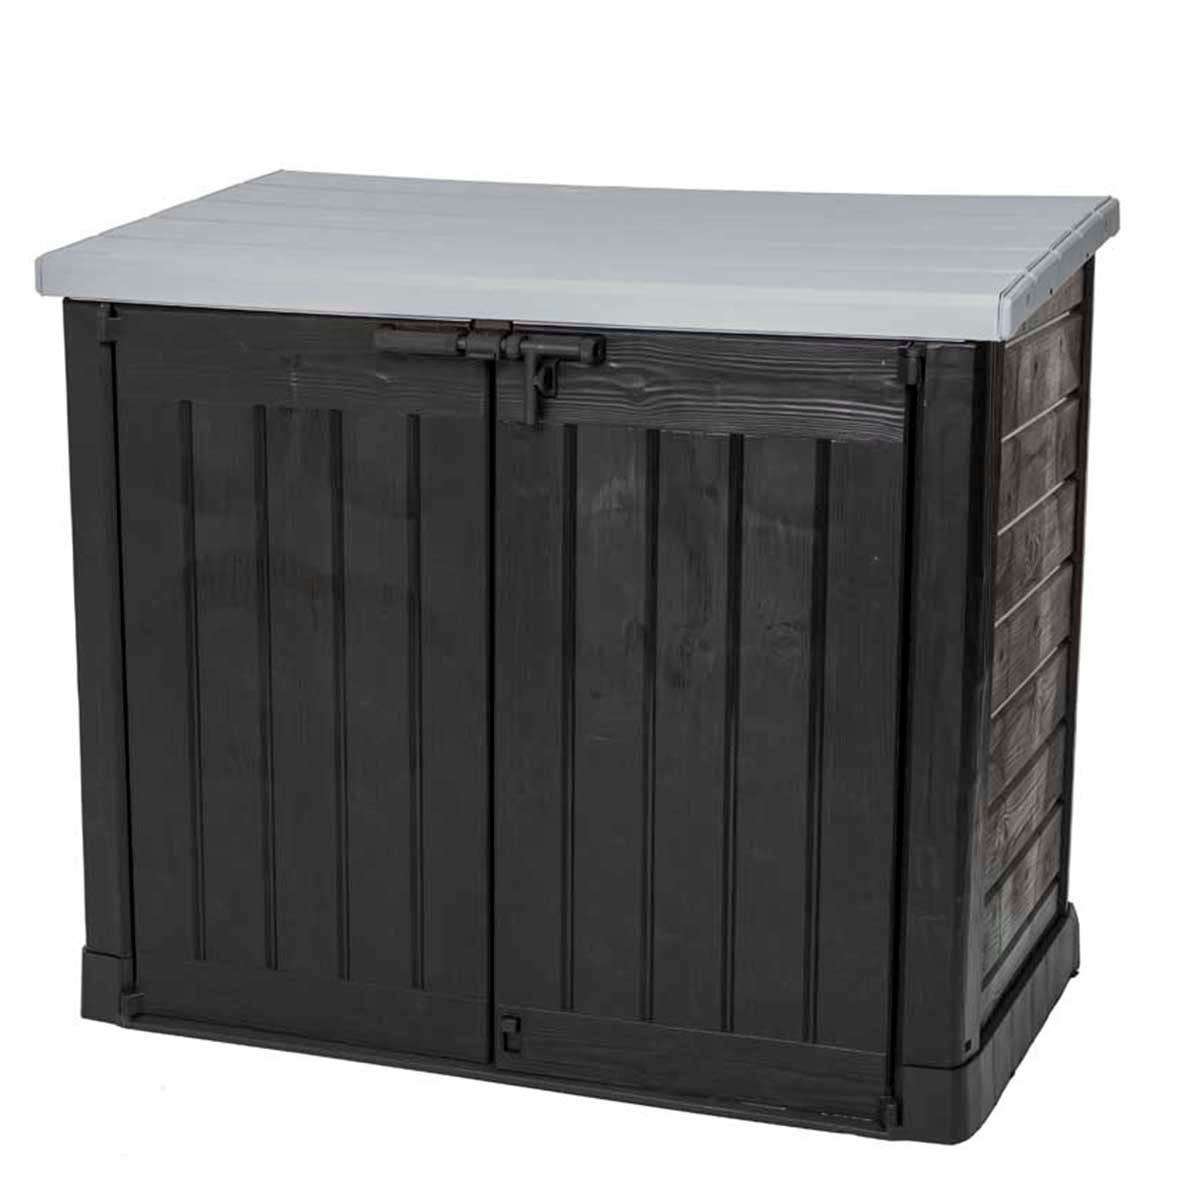 Keter Hideaway 1200L Storage Shed - Grey